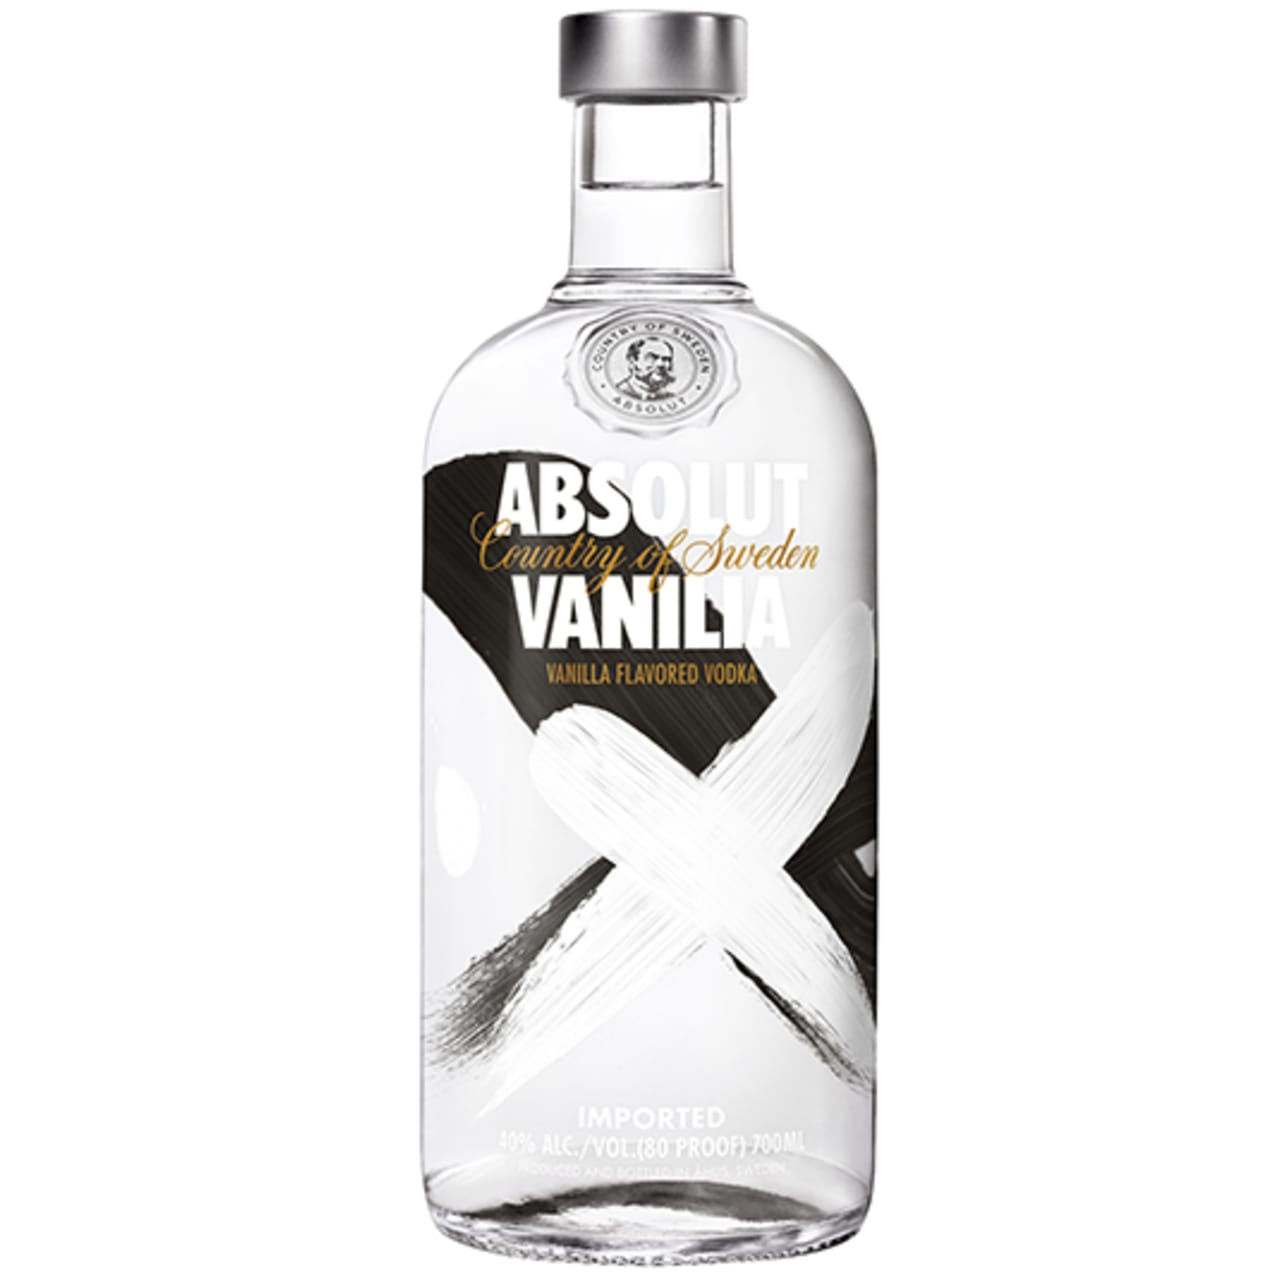 Product Image - Absolut Vanilia Vodka